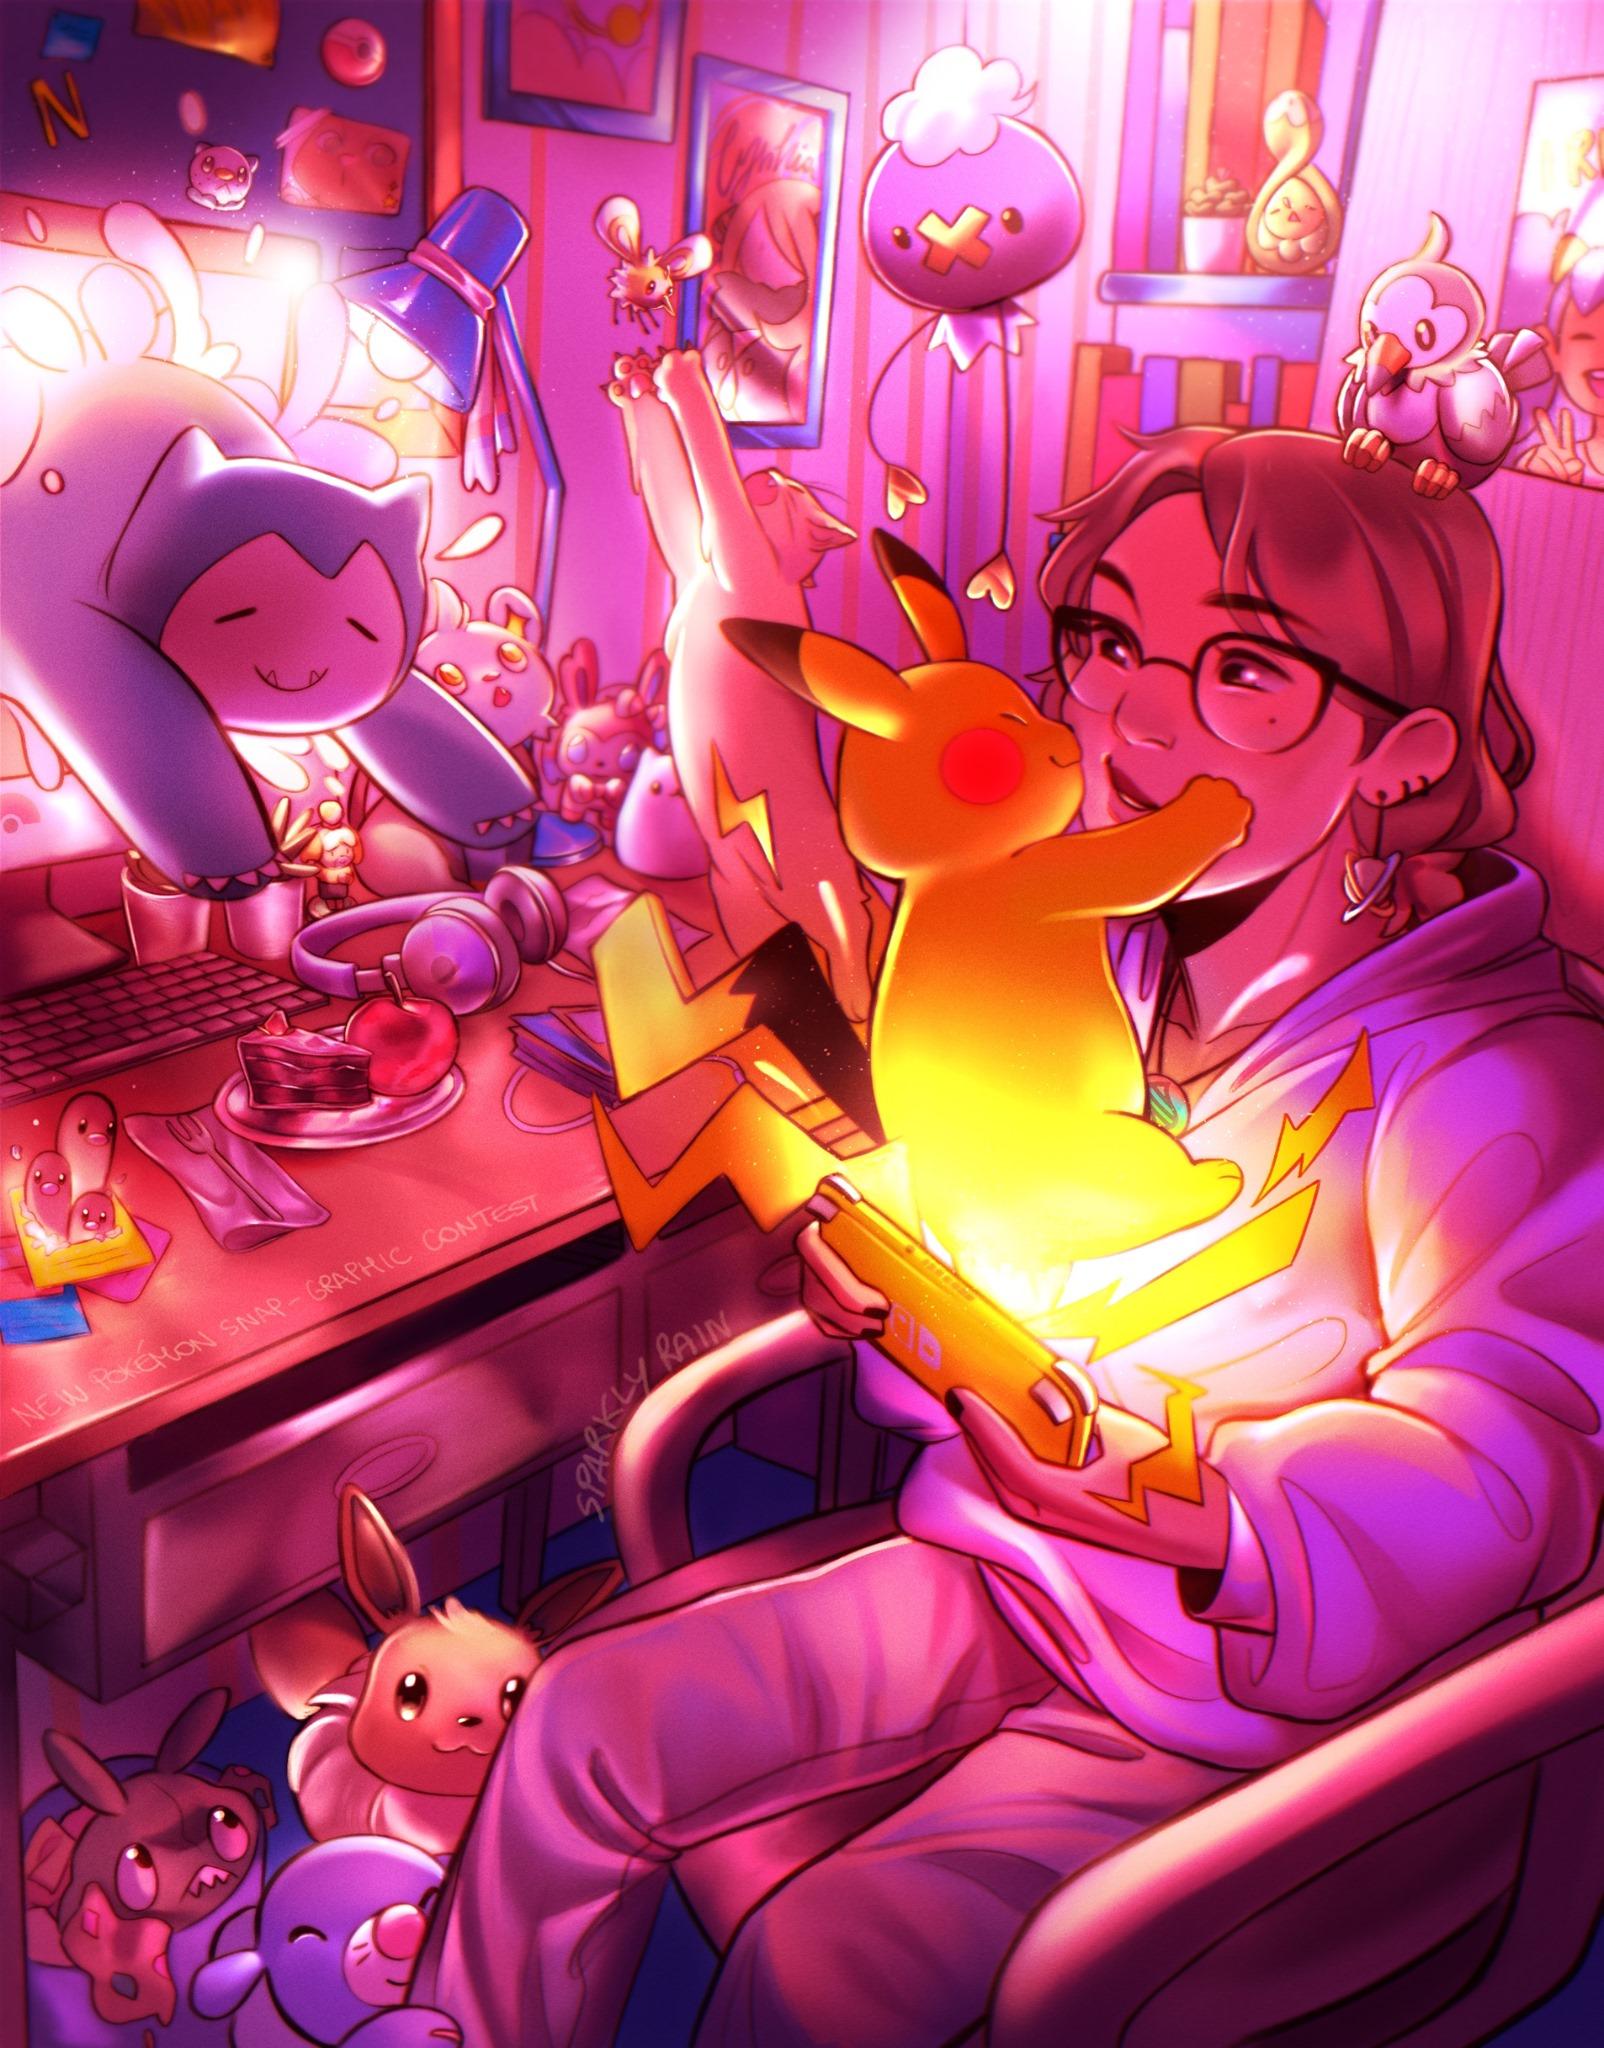 Sparkly Rain - New Pokémon Snap Graphic Contest